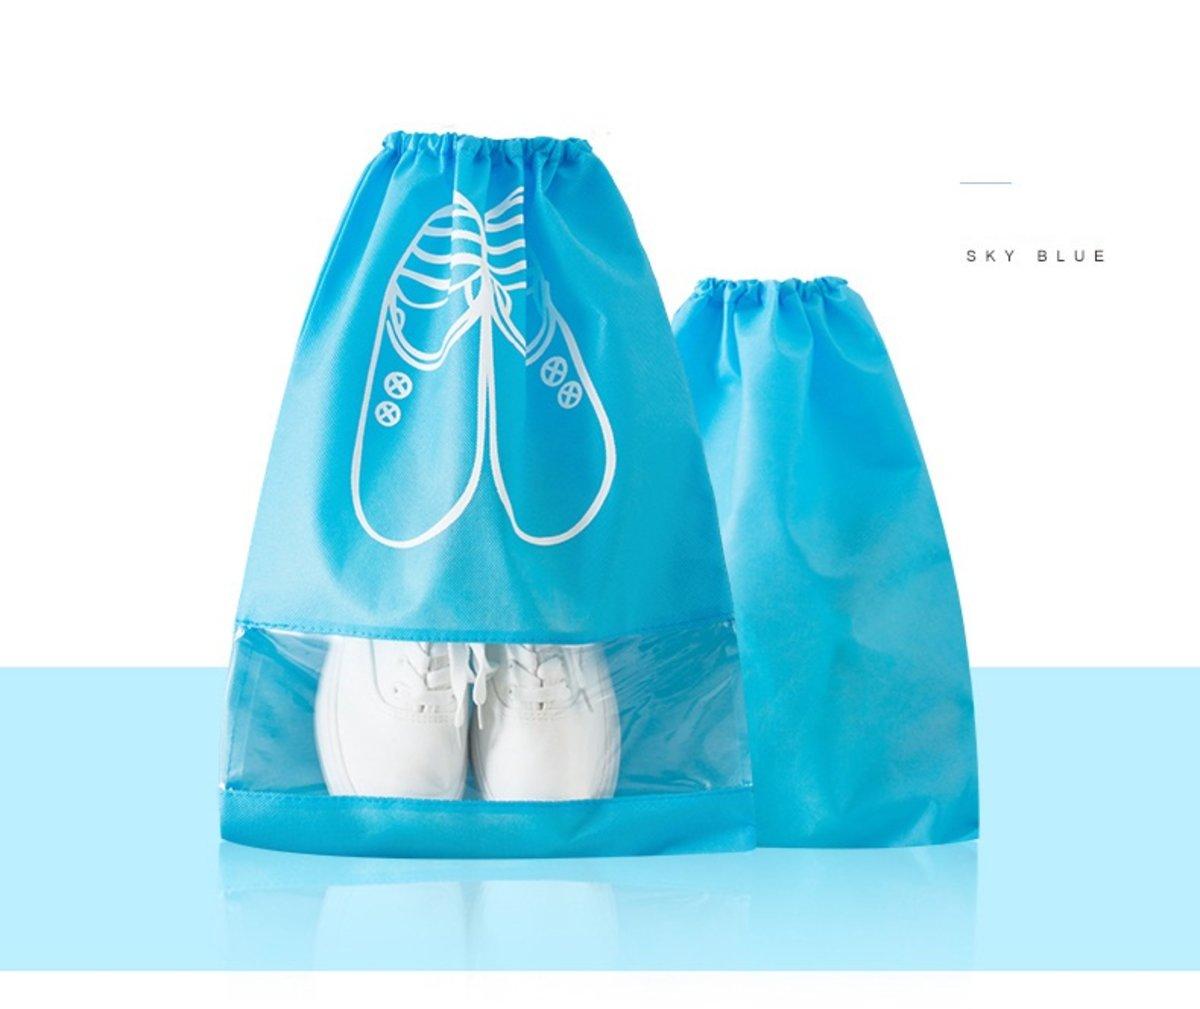 Home Travel Storage Shoe Bag - 5 Large 5 Medium (Light Blue)